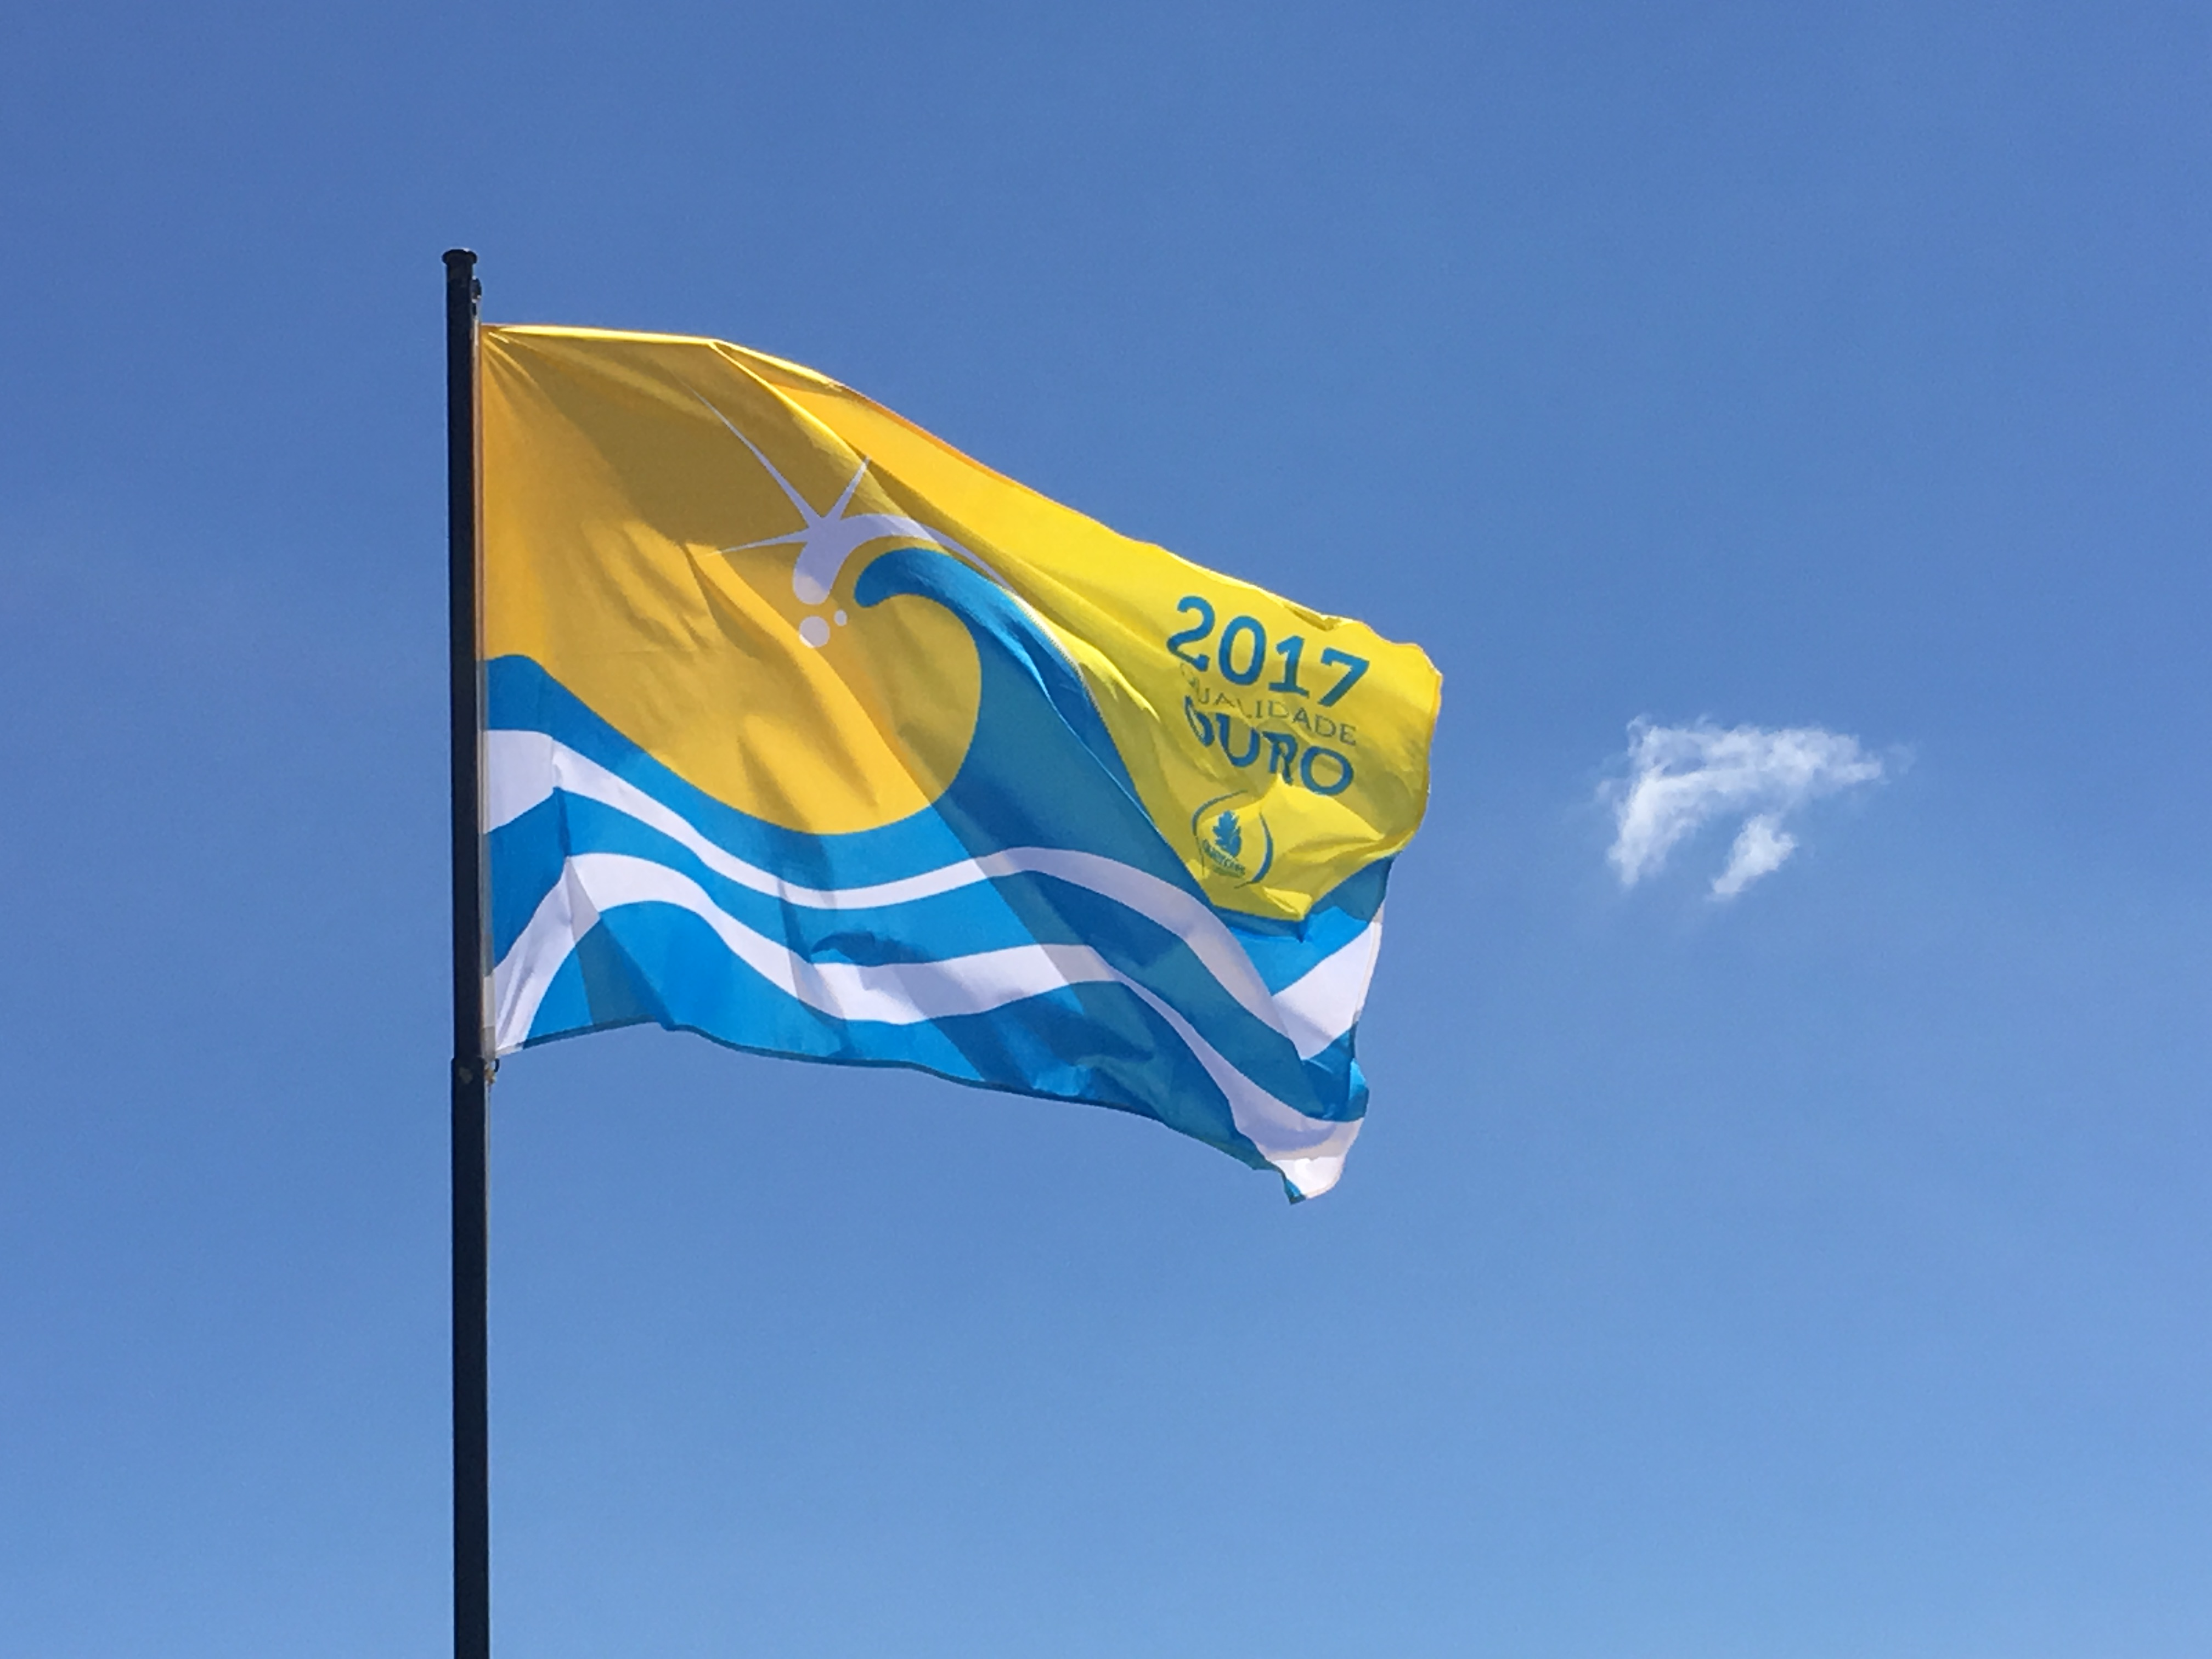 bandeira qual ouro